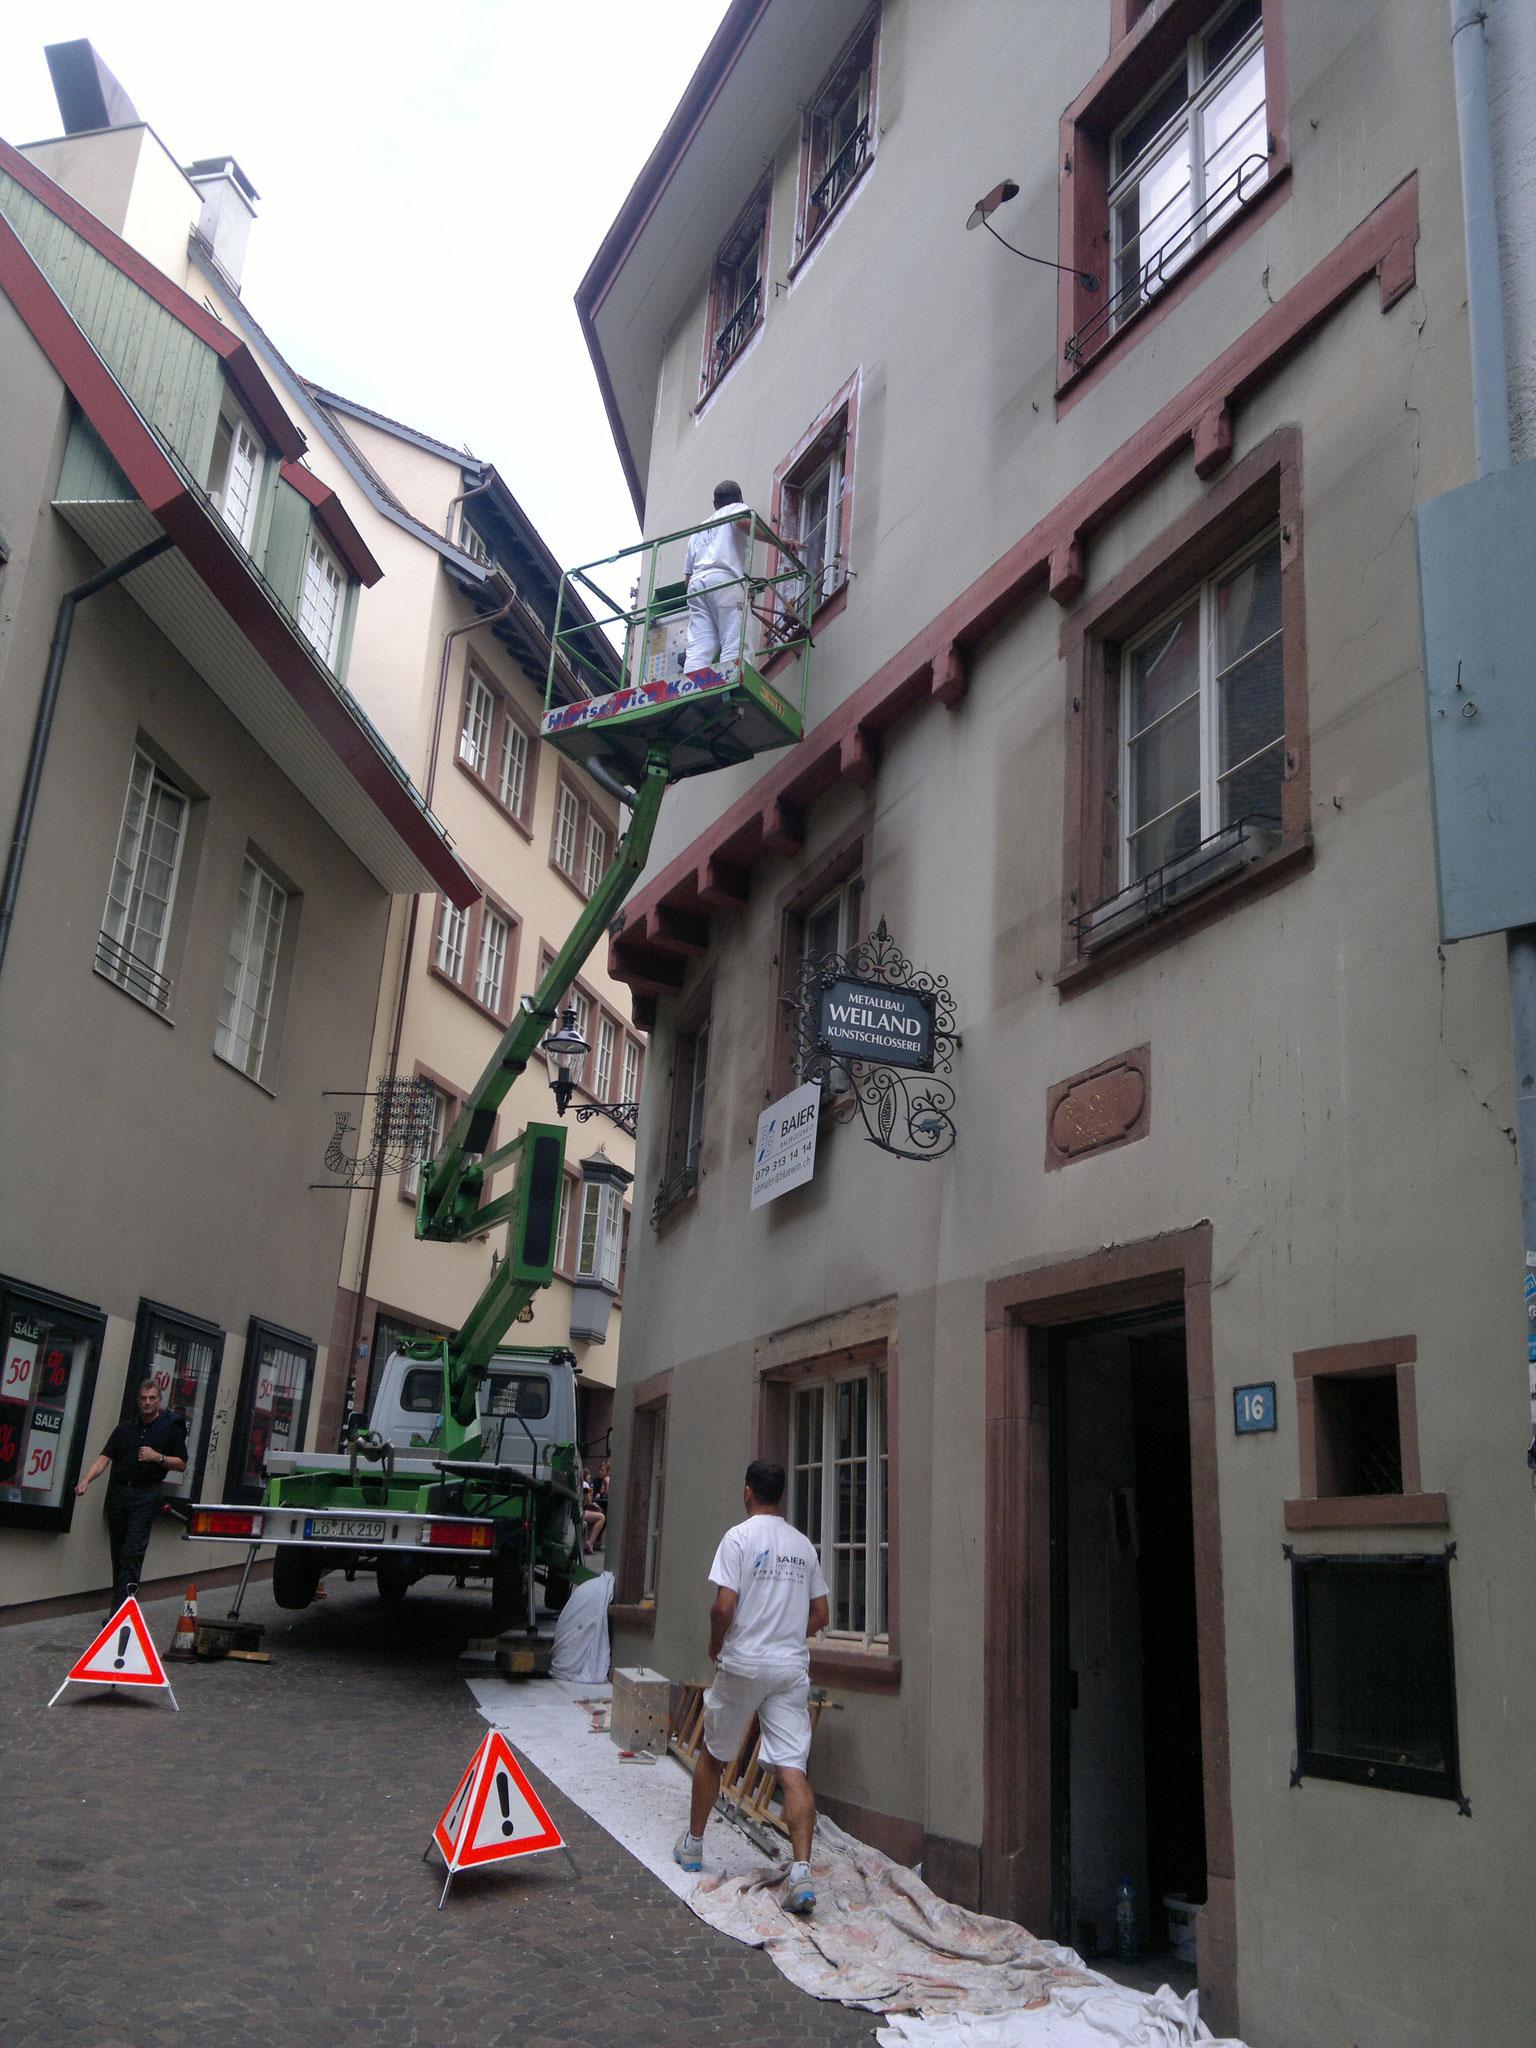 Fassadenanstrich mittels Hebebühne, Münsterberg in 4051 Basel.